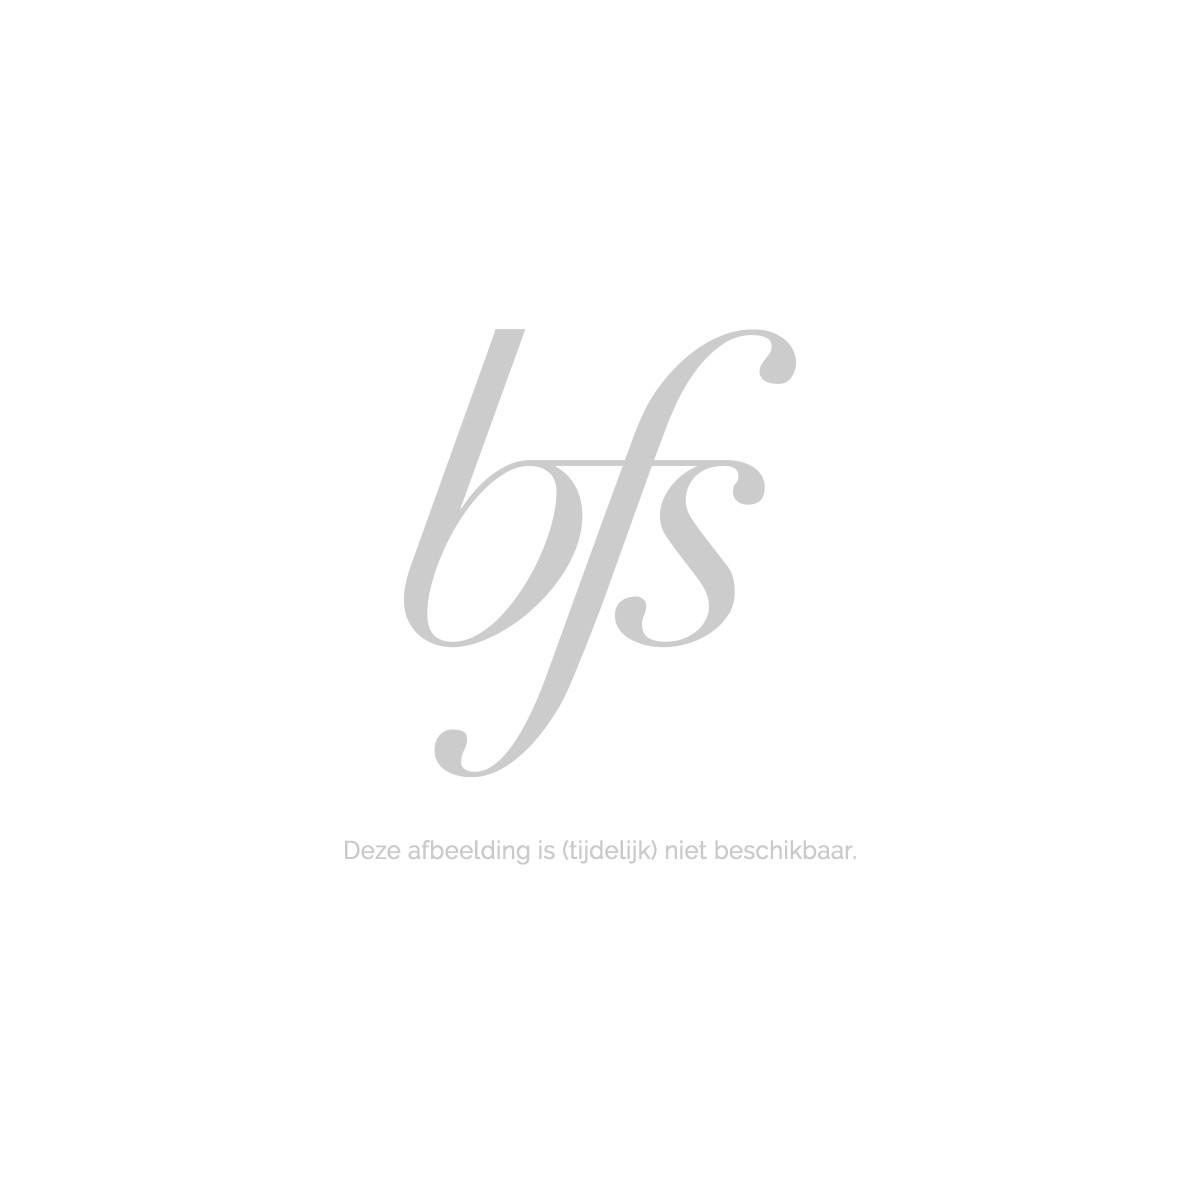 Beautyblender Instaclean